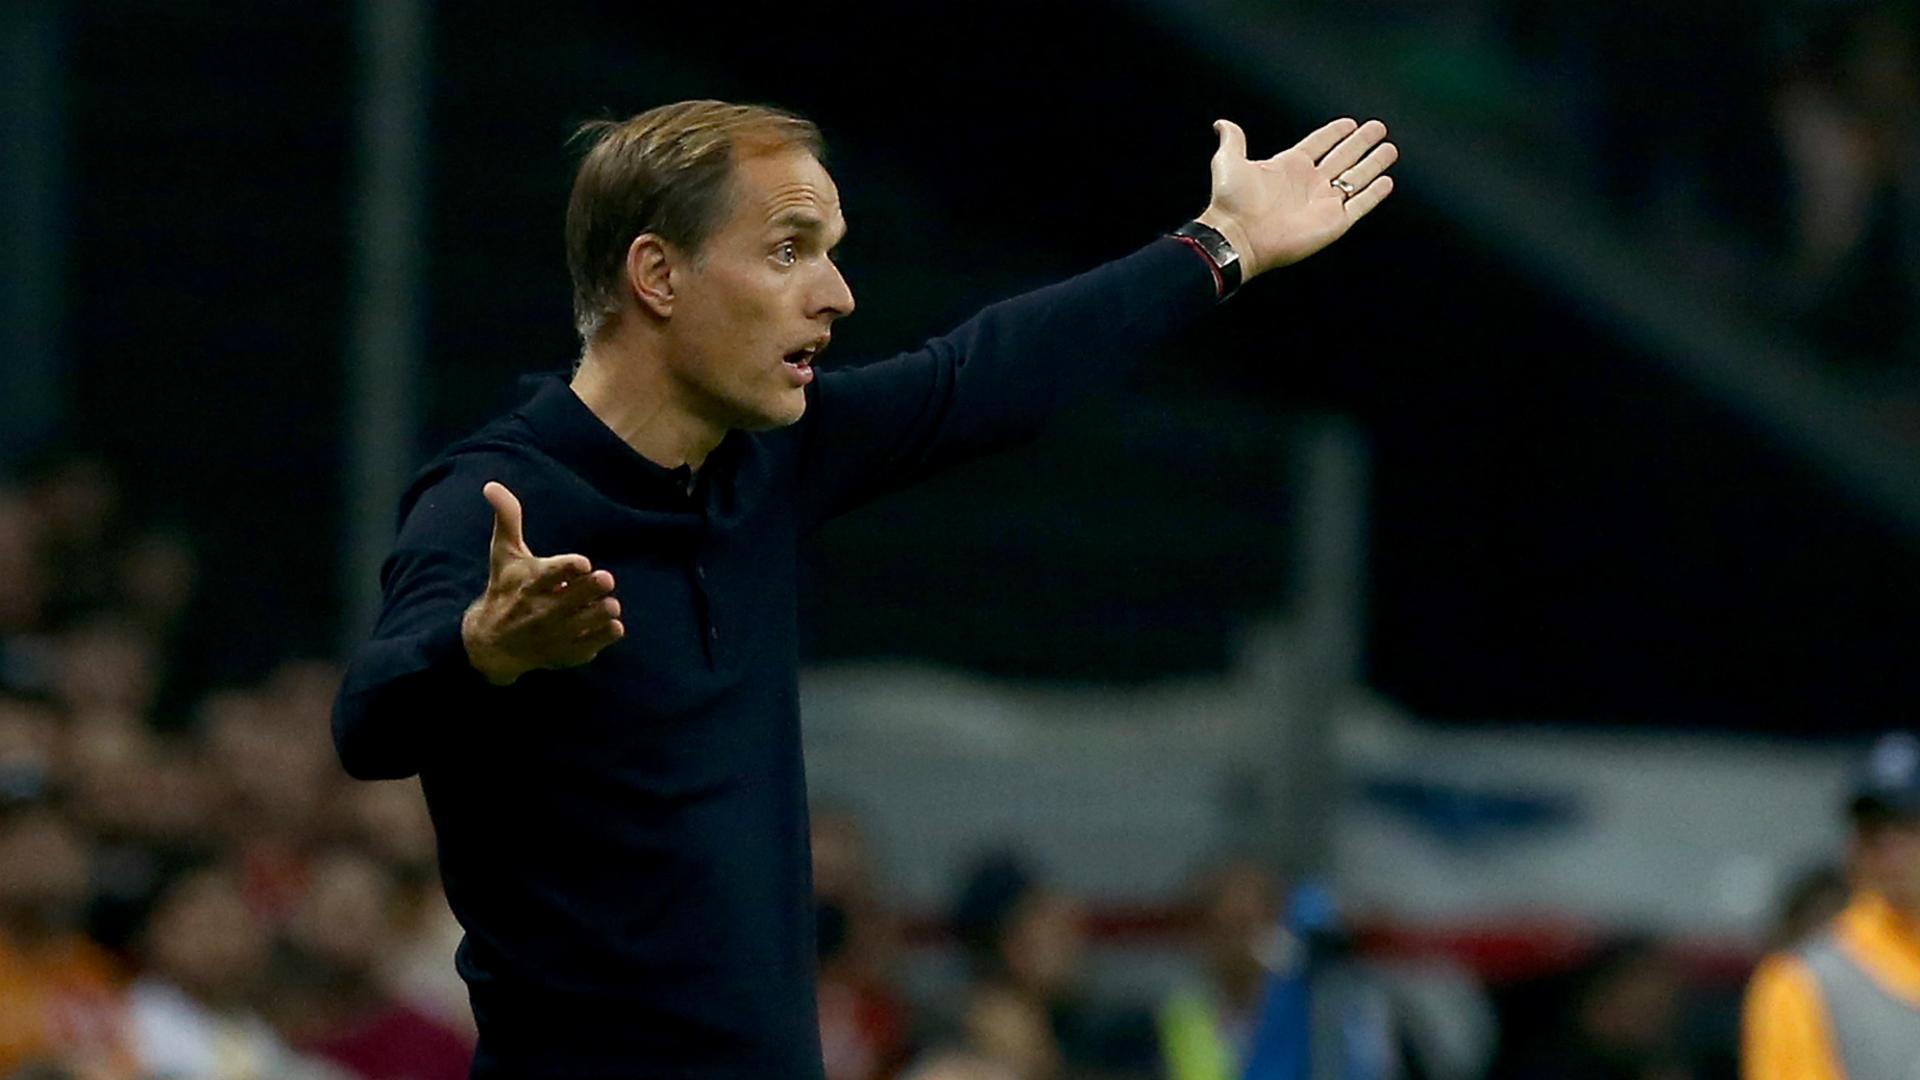 'I'm not interested' - PSG boss Tuchel shuts down links to Bayern job